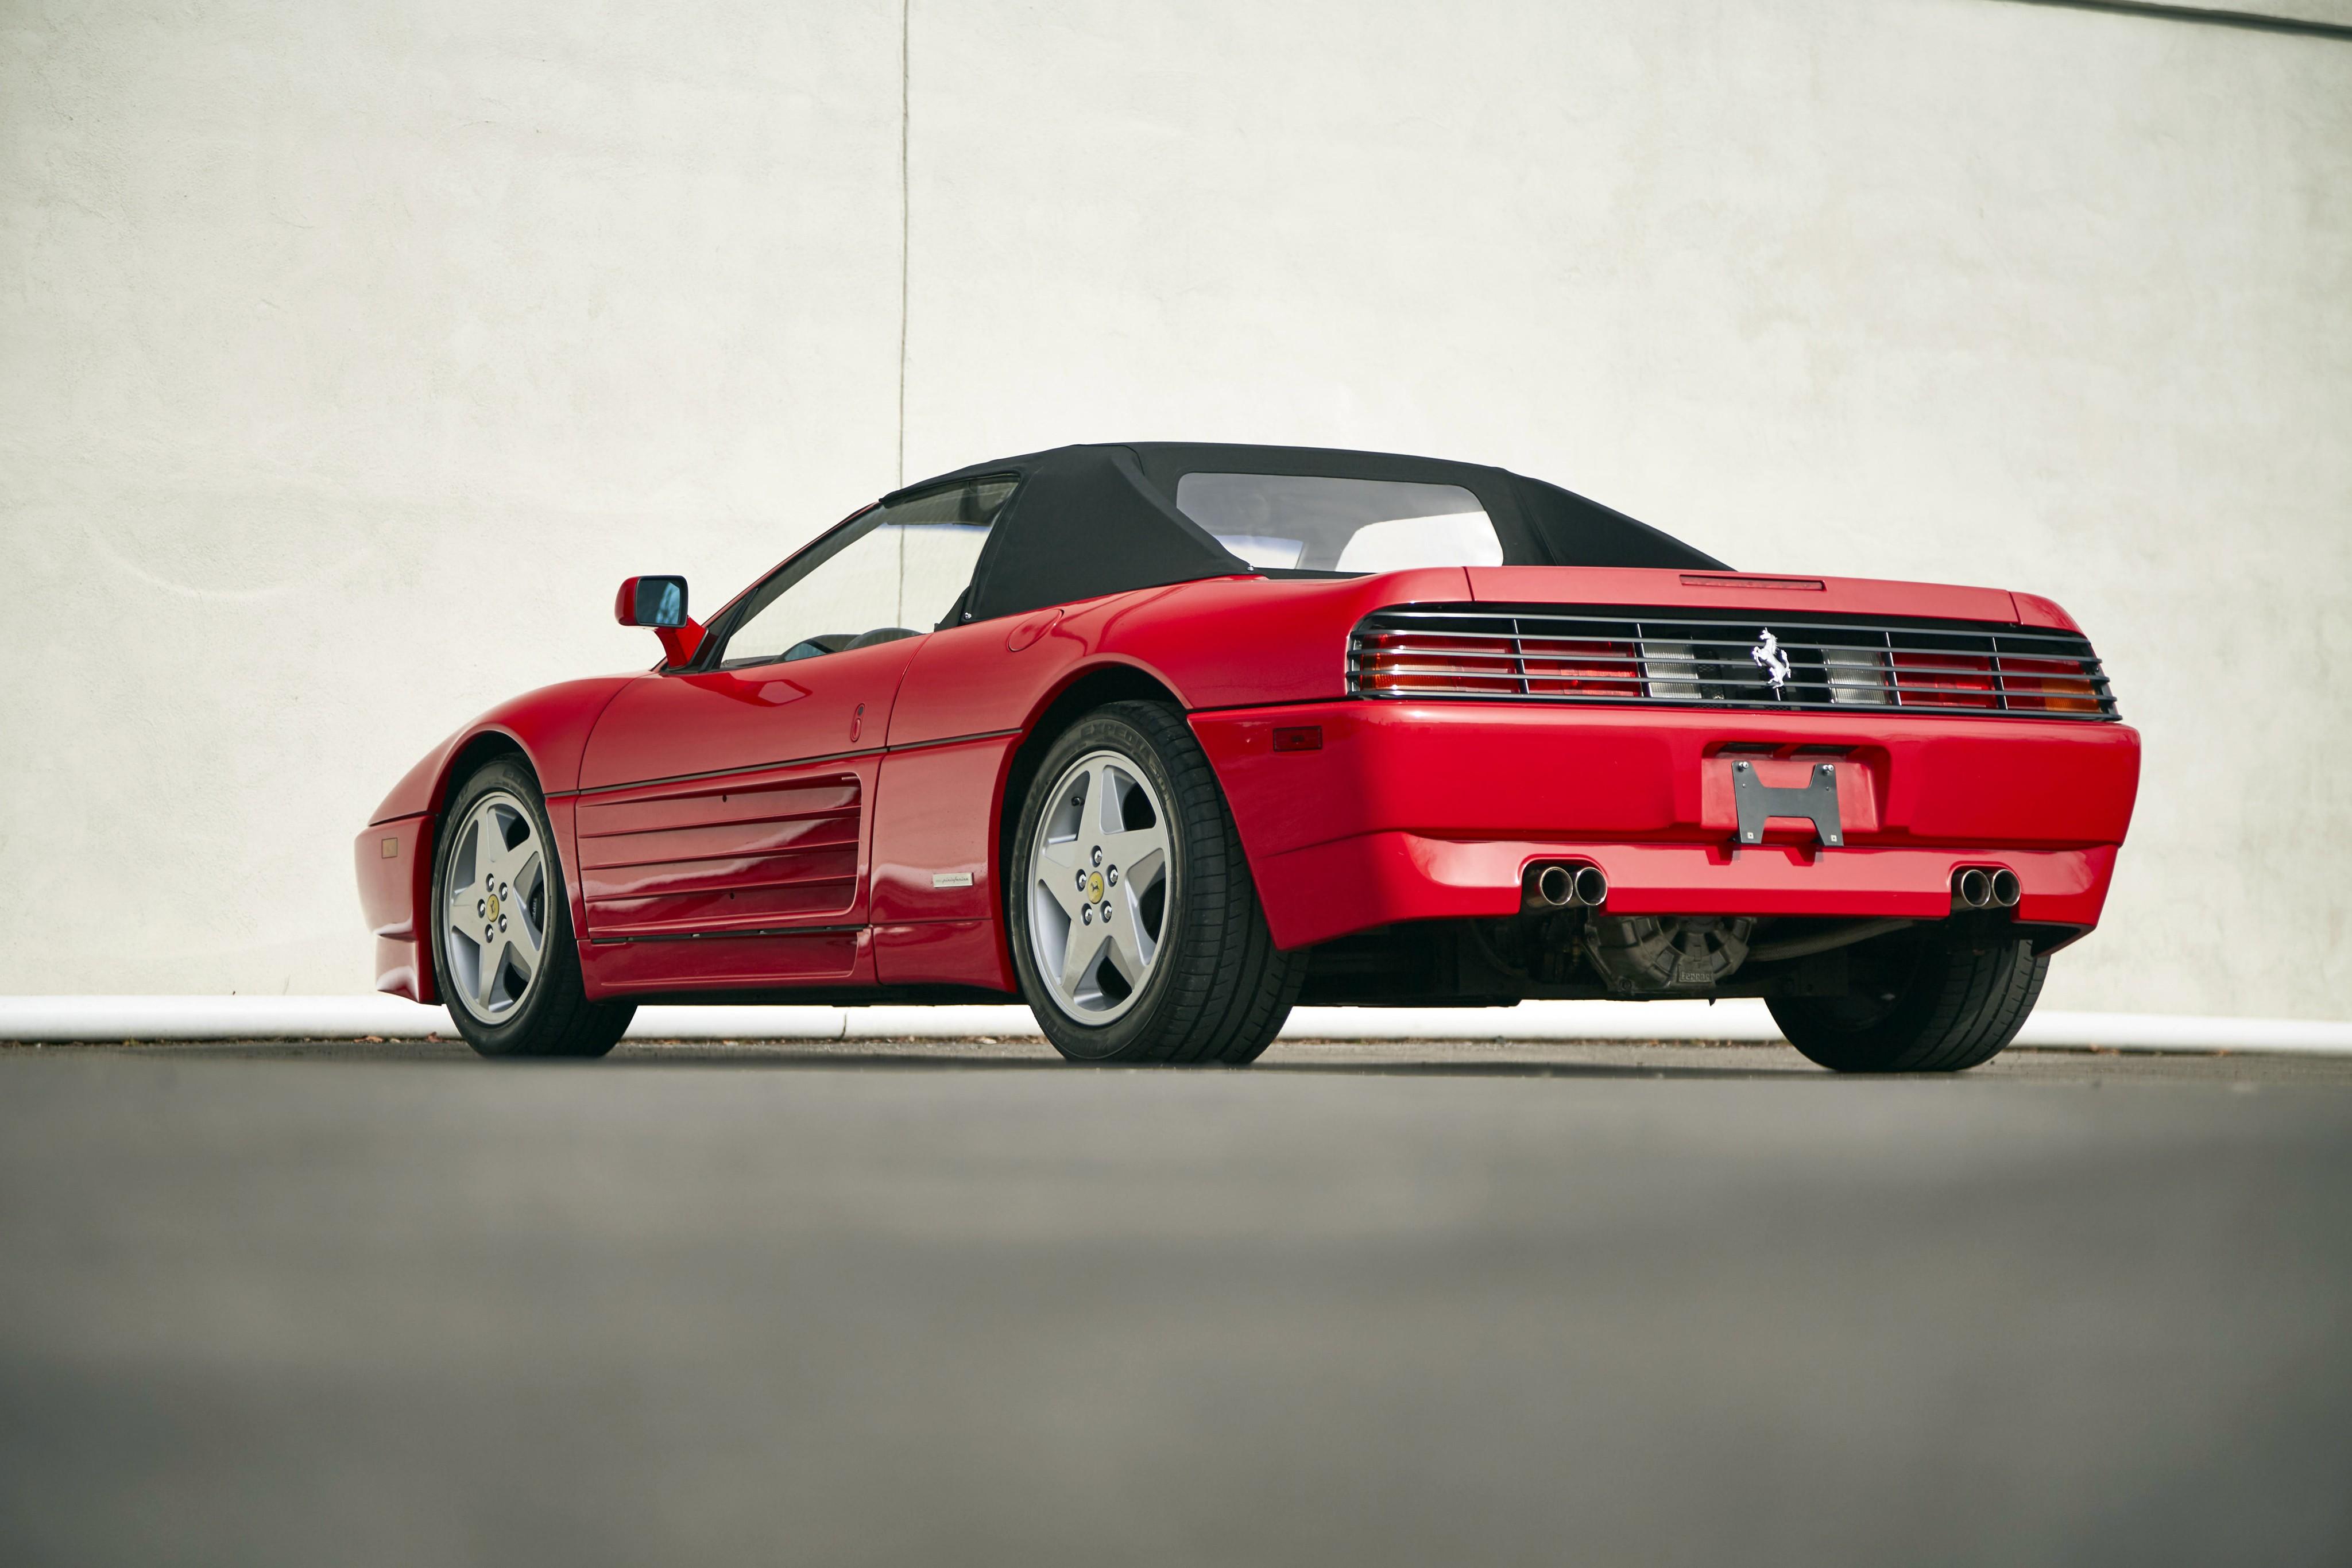 FERRARI-348-Spider-1070_29 Extraordinary Ferrari Mondial 3.4 T Review Cars Trend